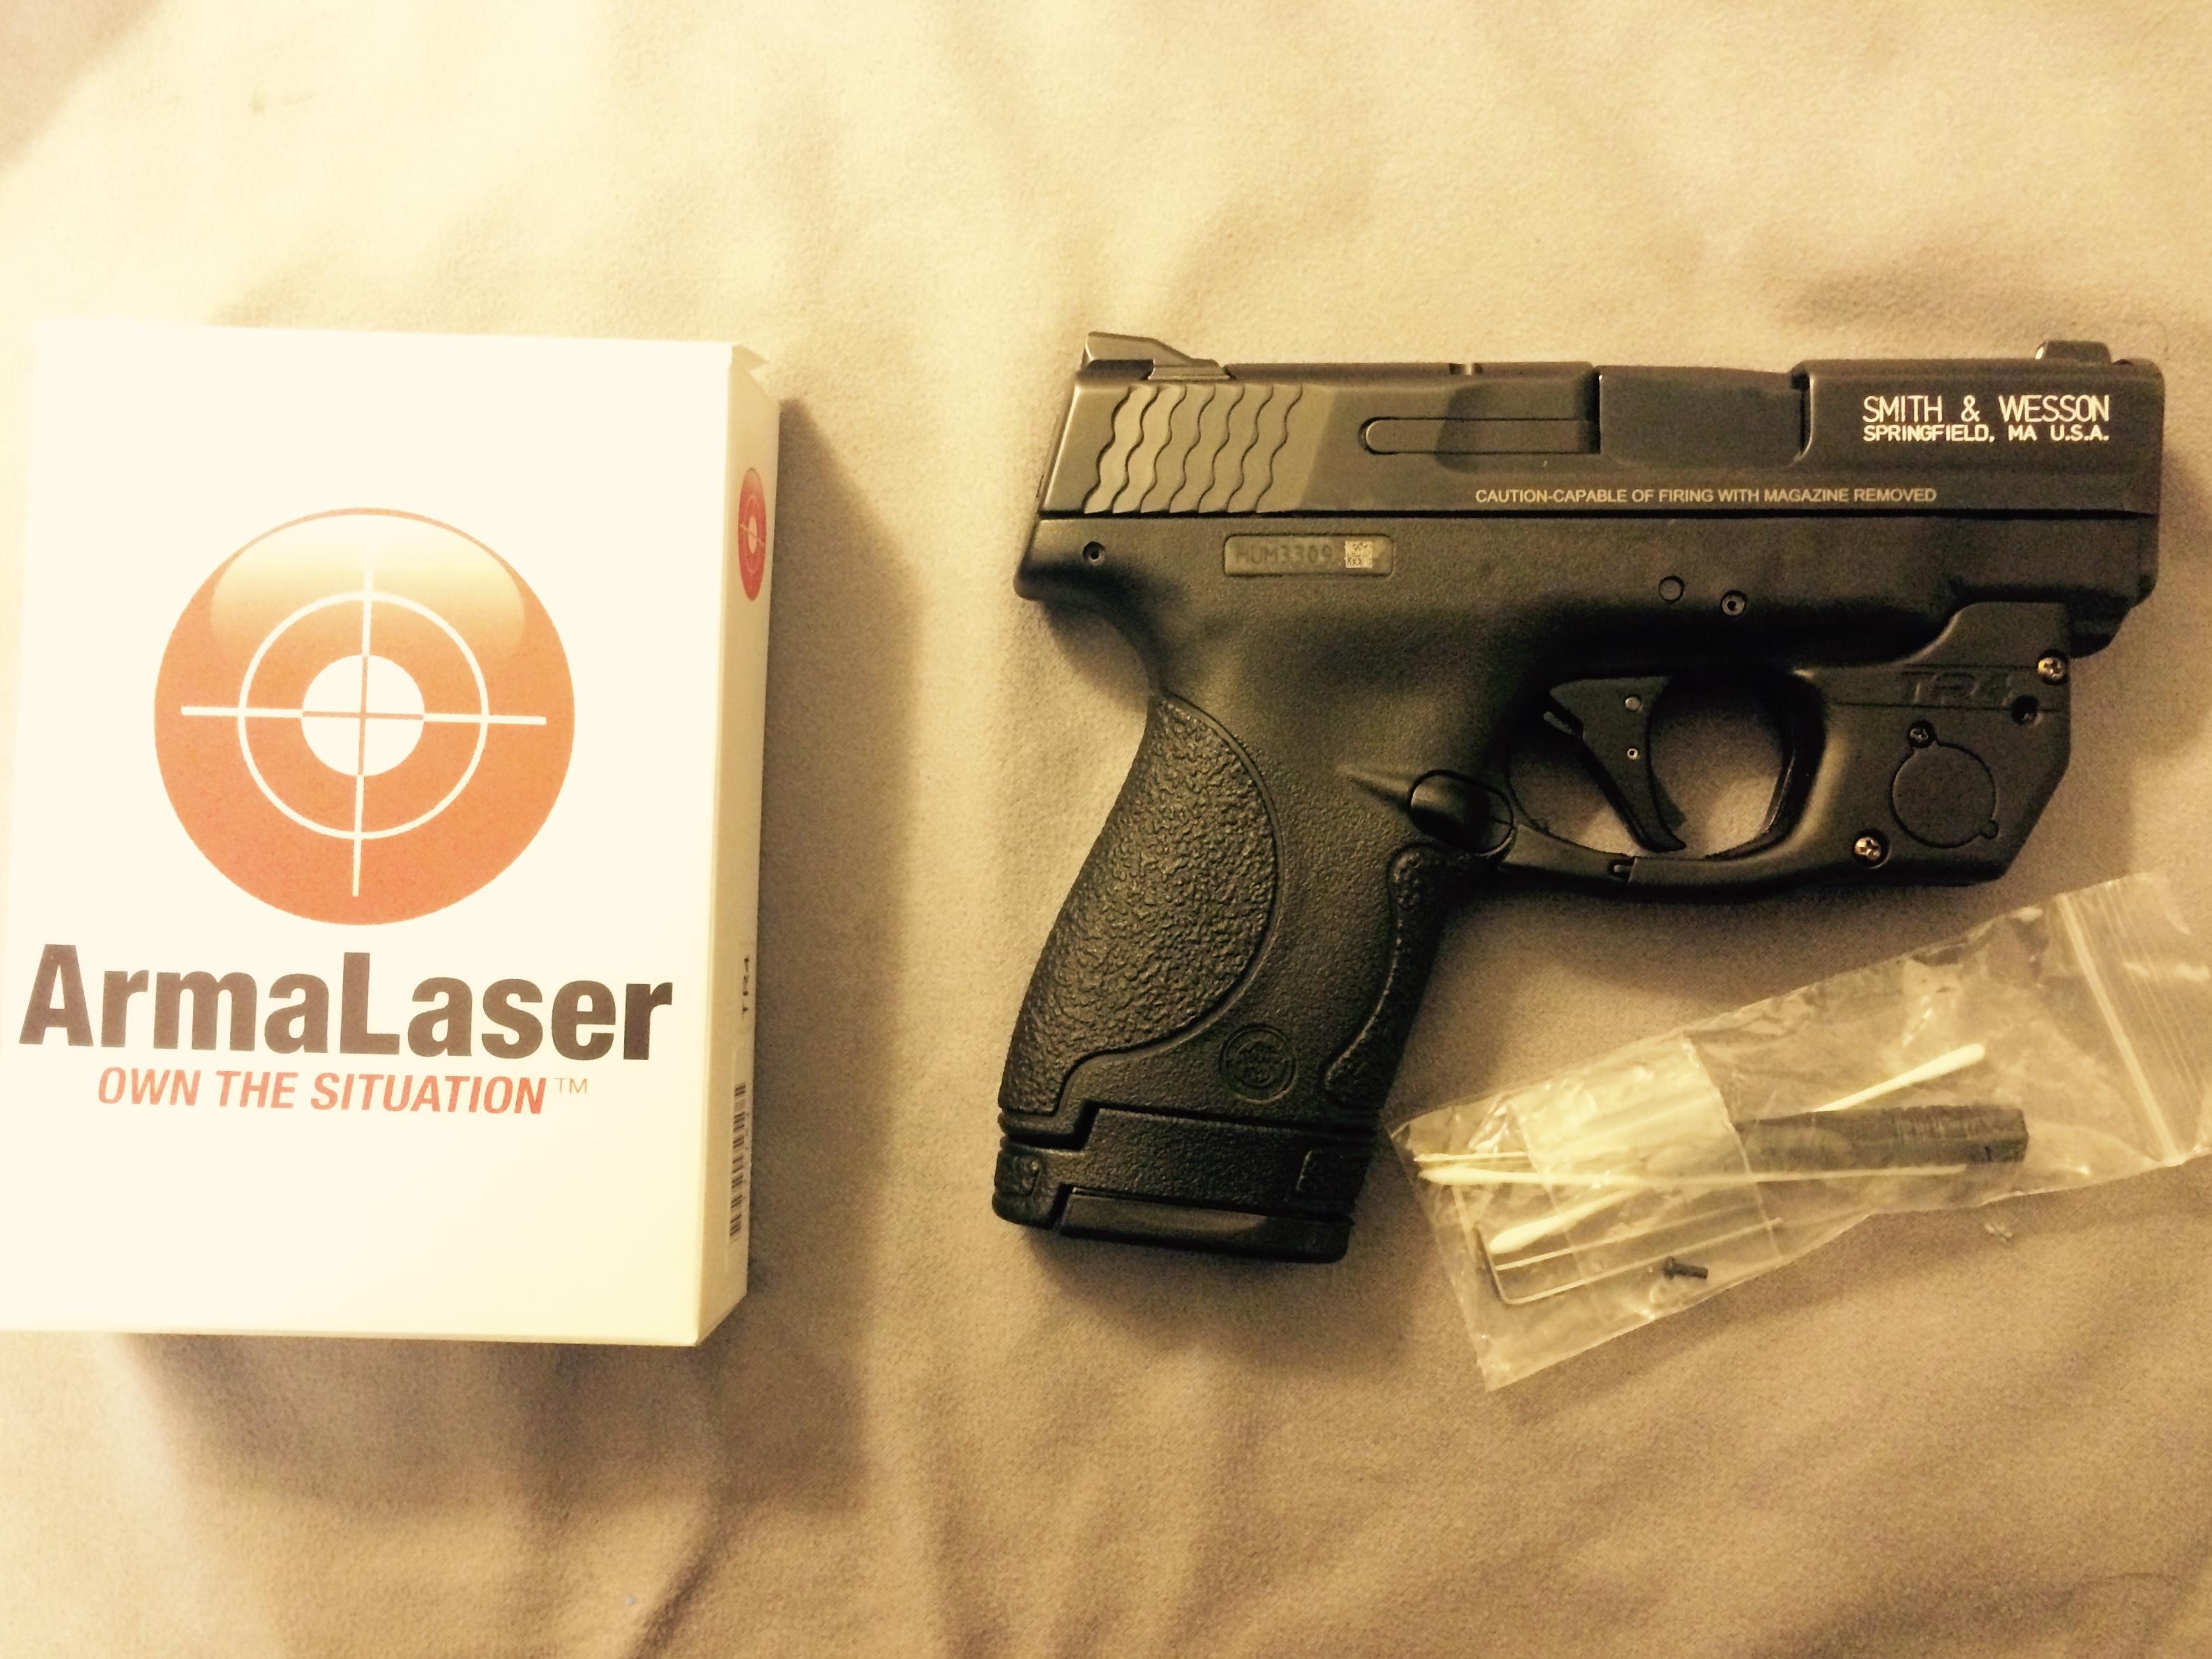 Laser for s&w shield-armalaser-tr4-s-w-m-p-shield-12.jpg